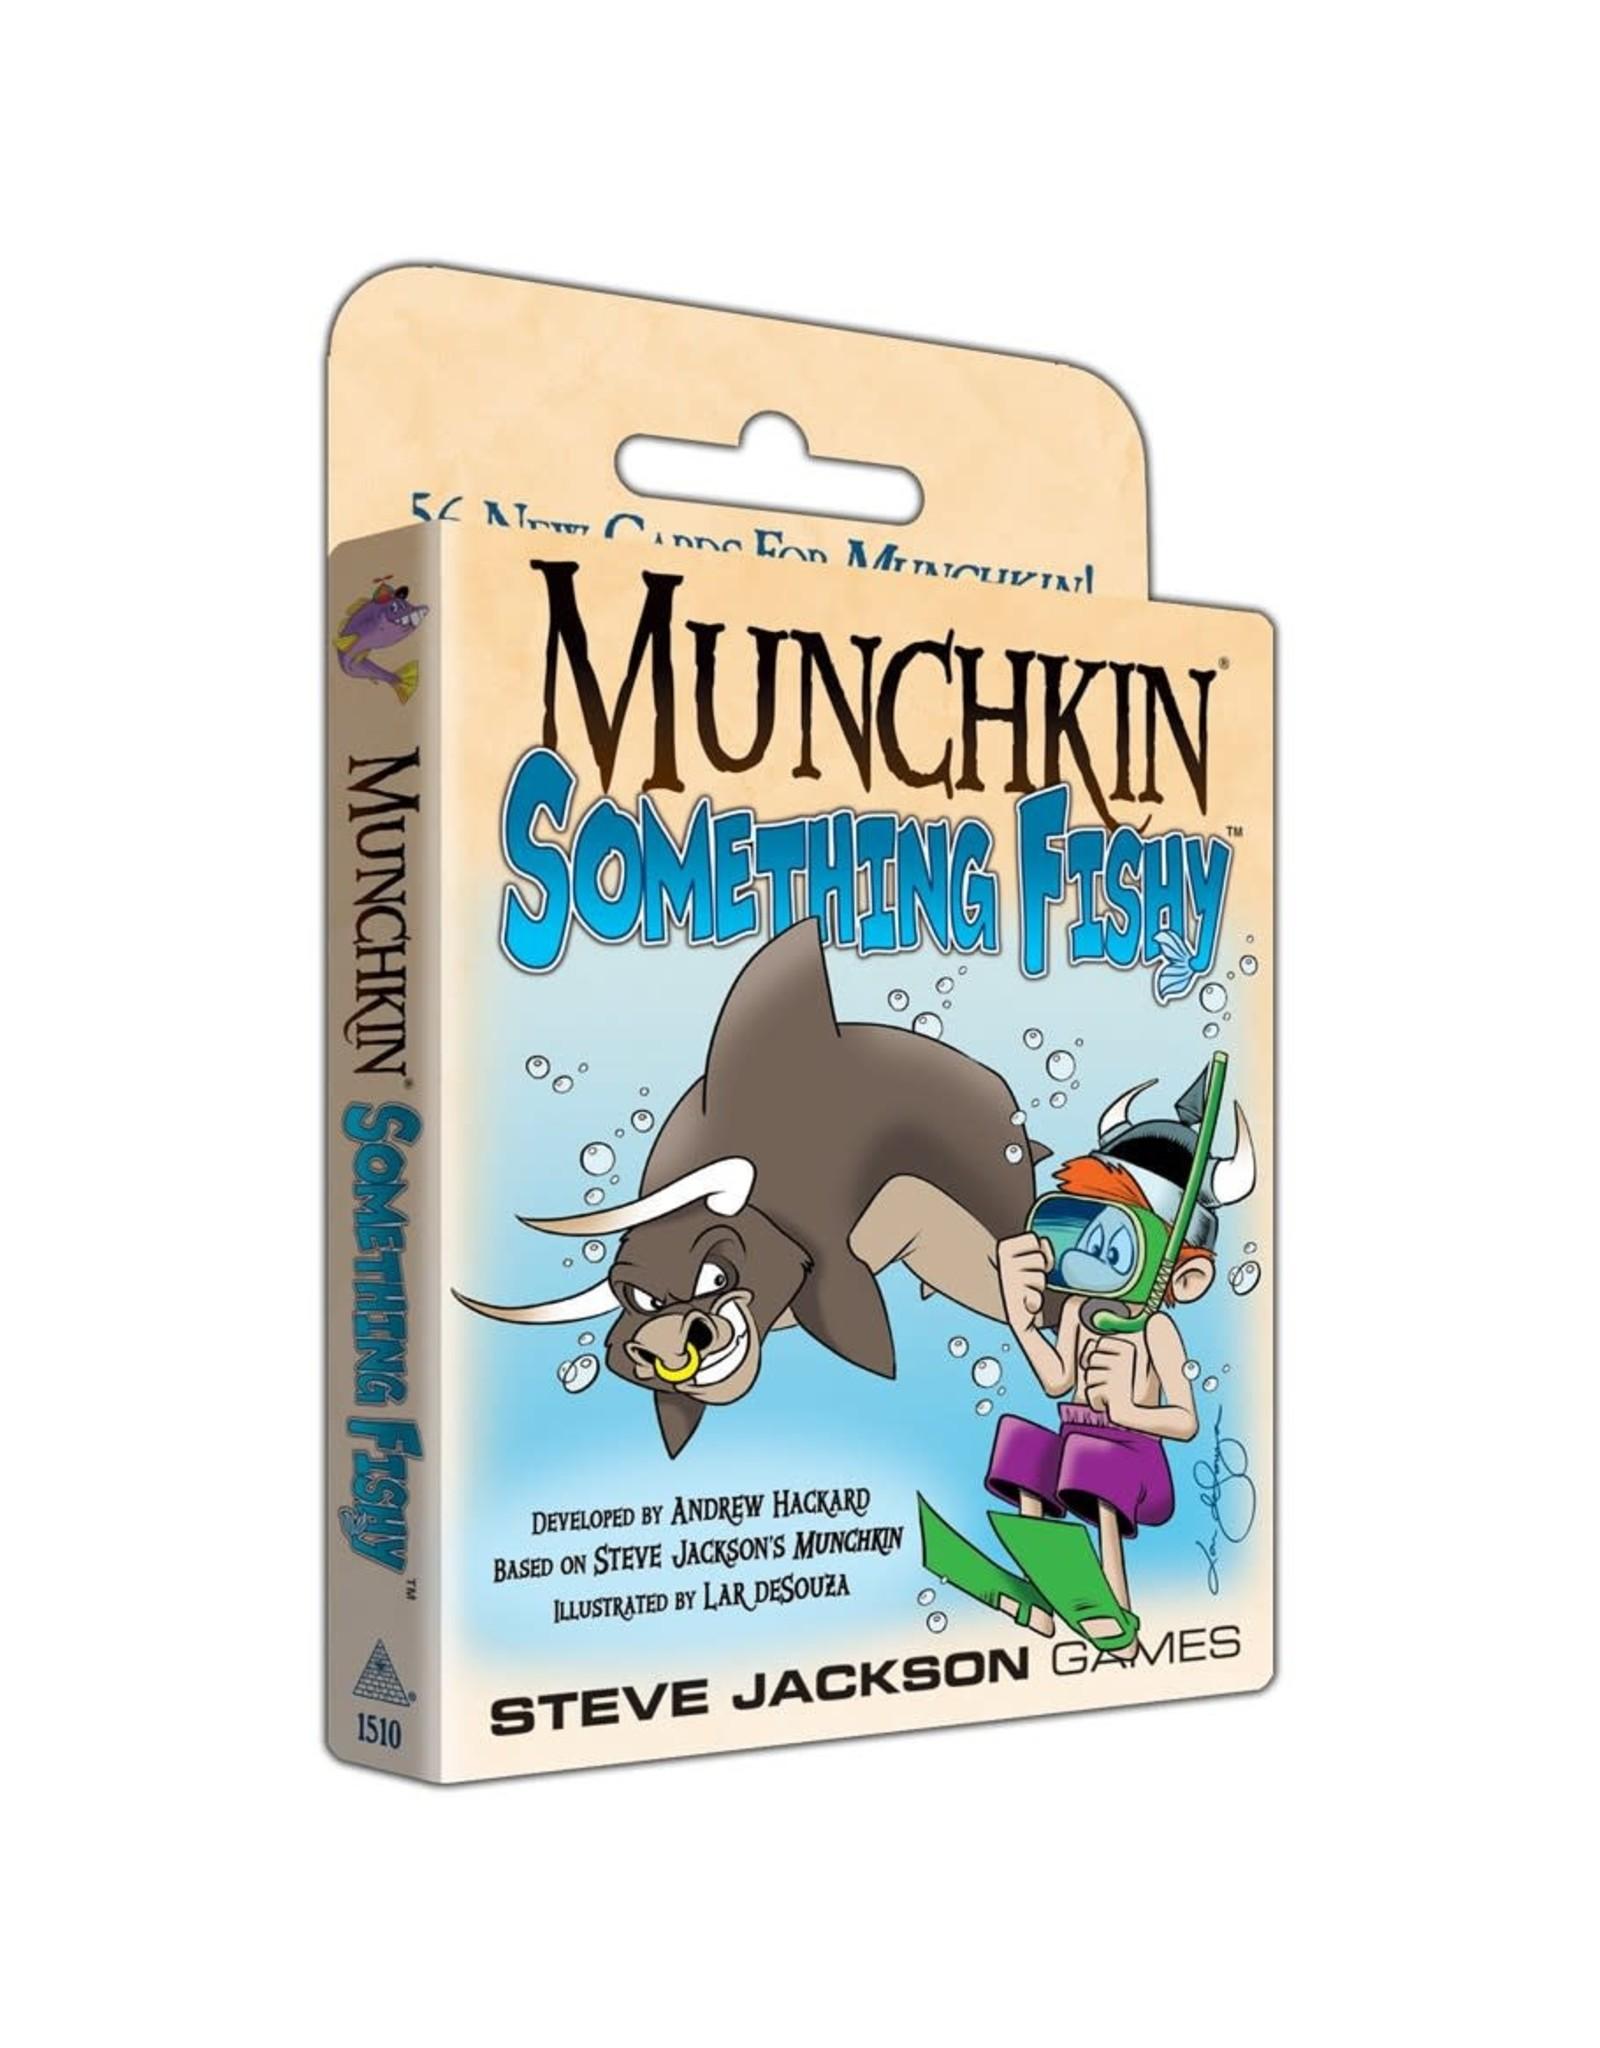 Steve Jackson Games Munchkin: Something Fishy Expansion